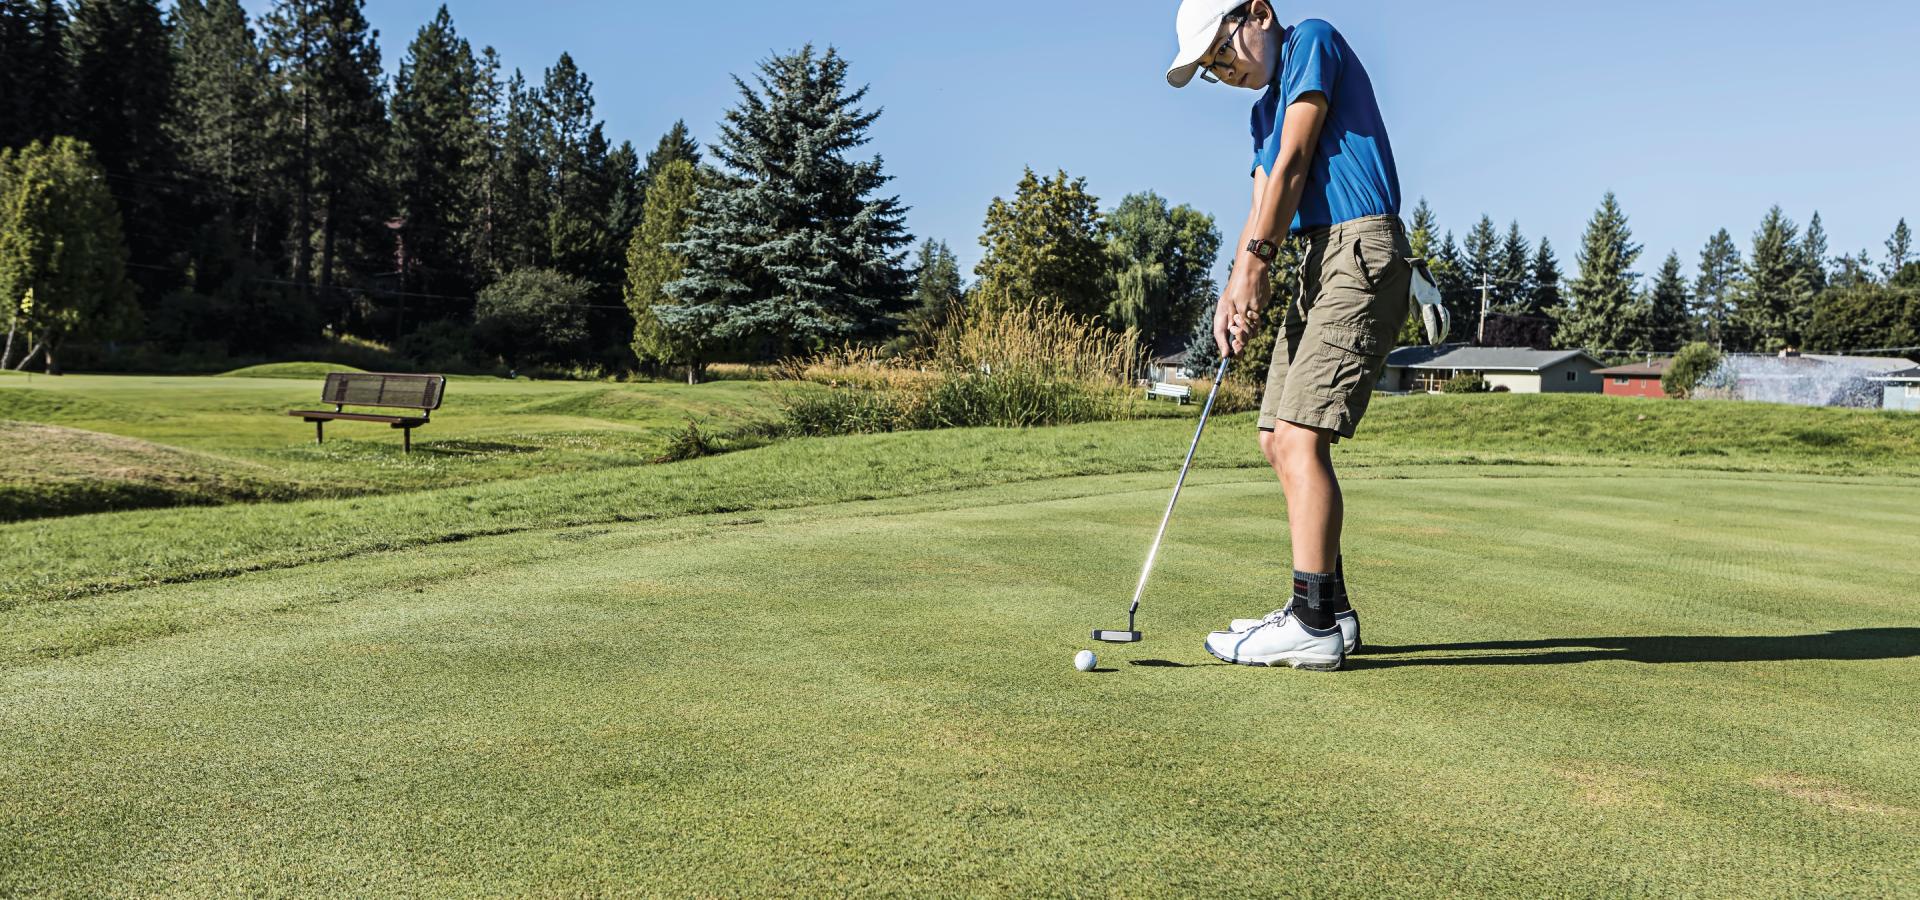 Golfing in Idaho